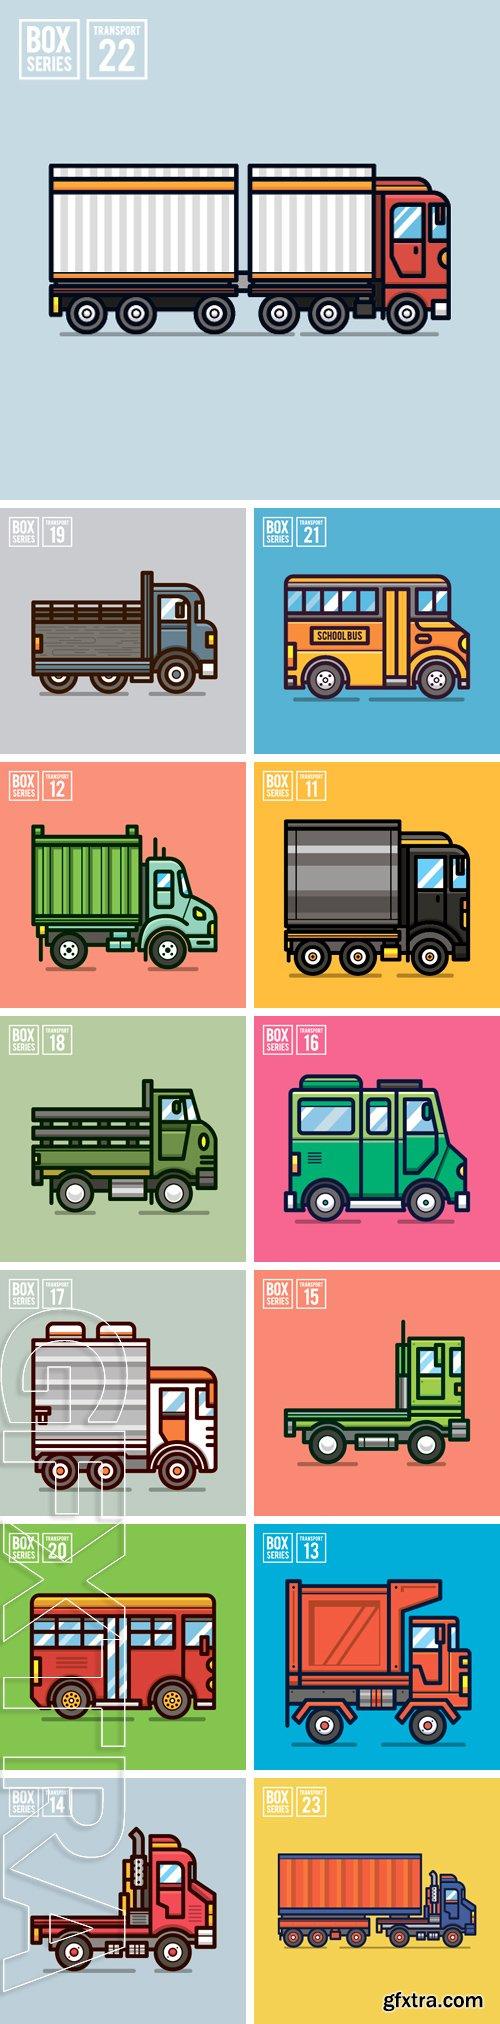 Stock Vectors - Transport illustration for website, publication, info graphic, etc